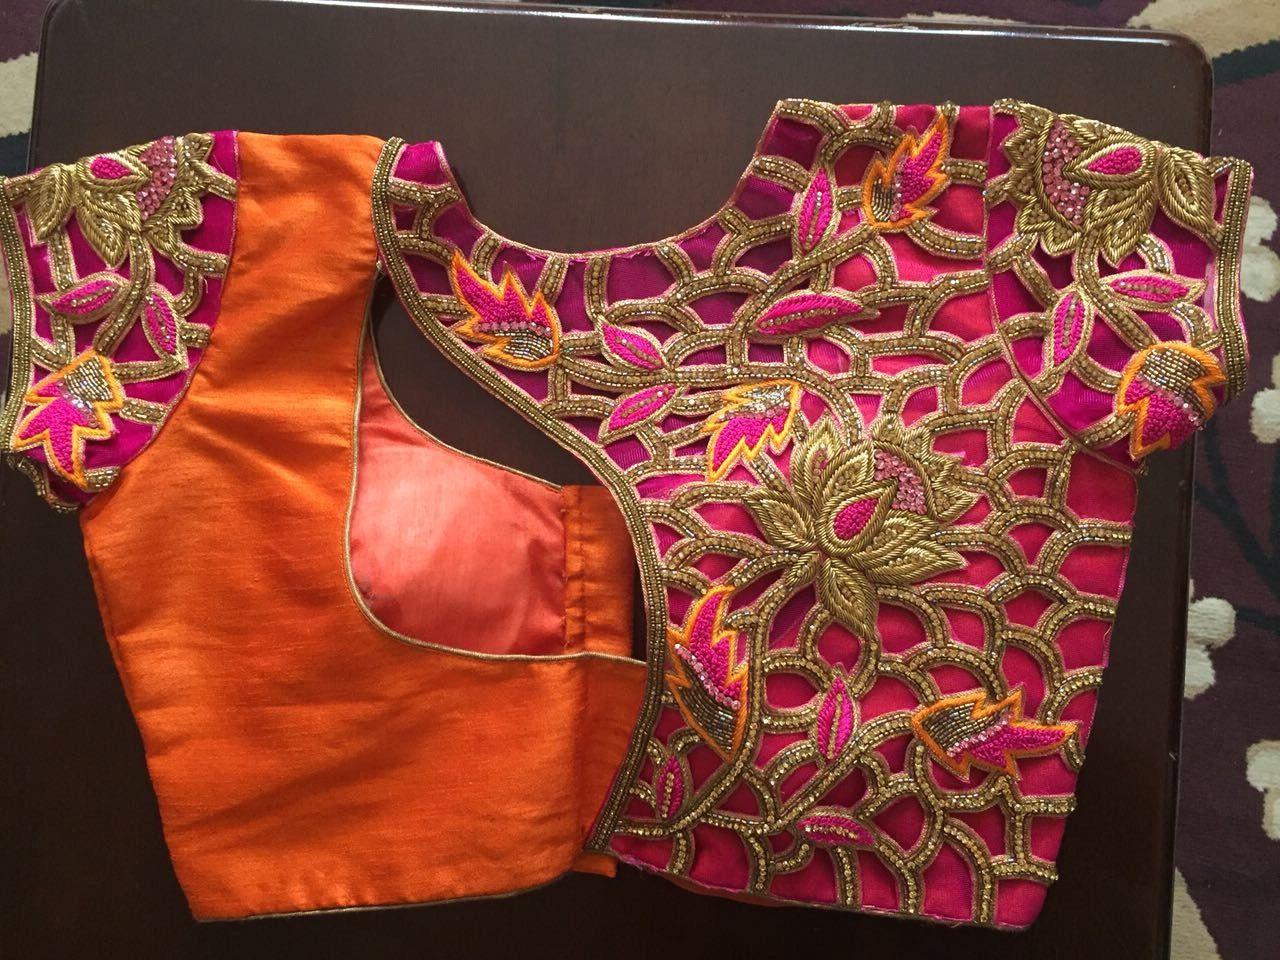 Design of saree blouse pin by nidhi raj on saree blouse design  pinterest  blouse designs